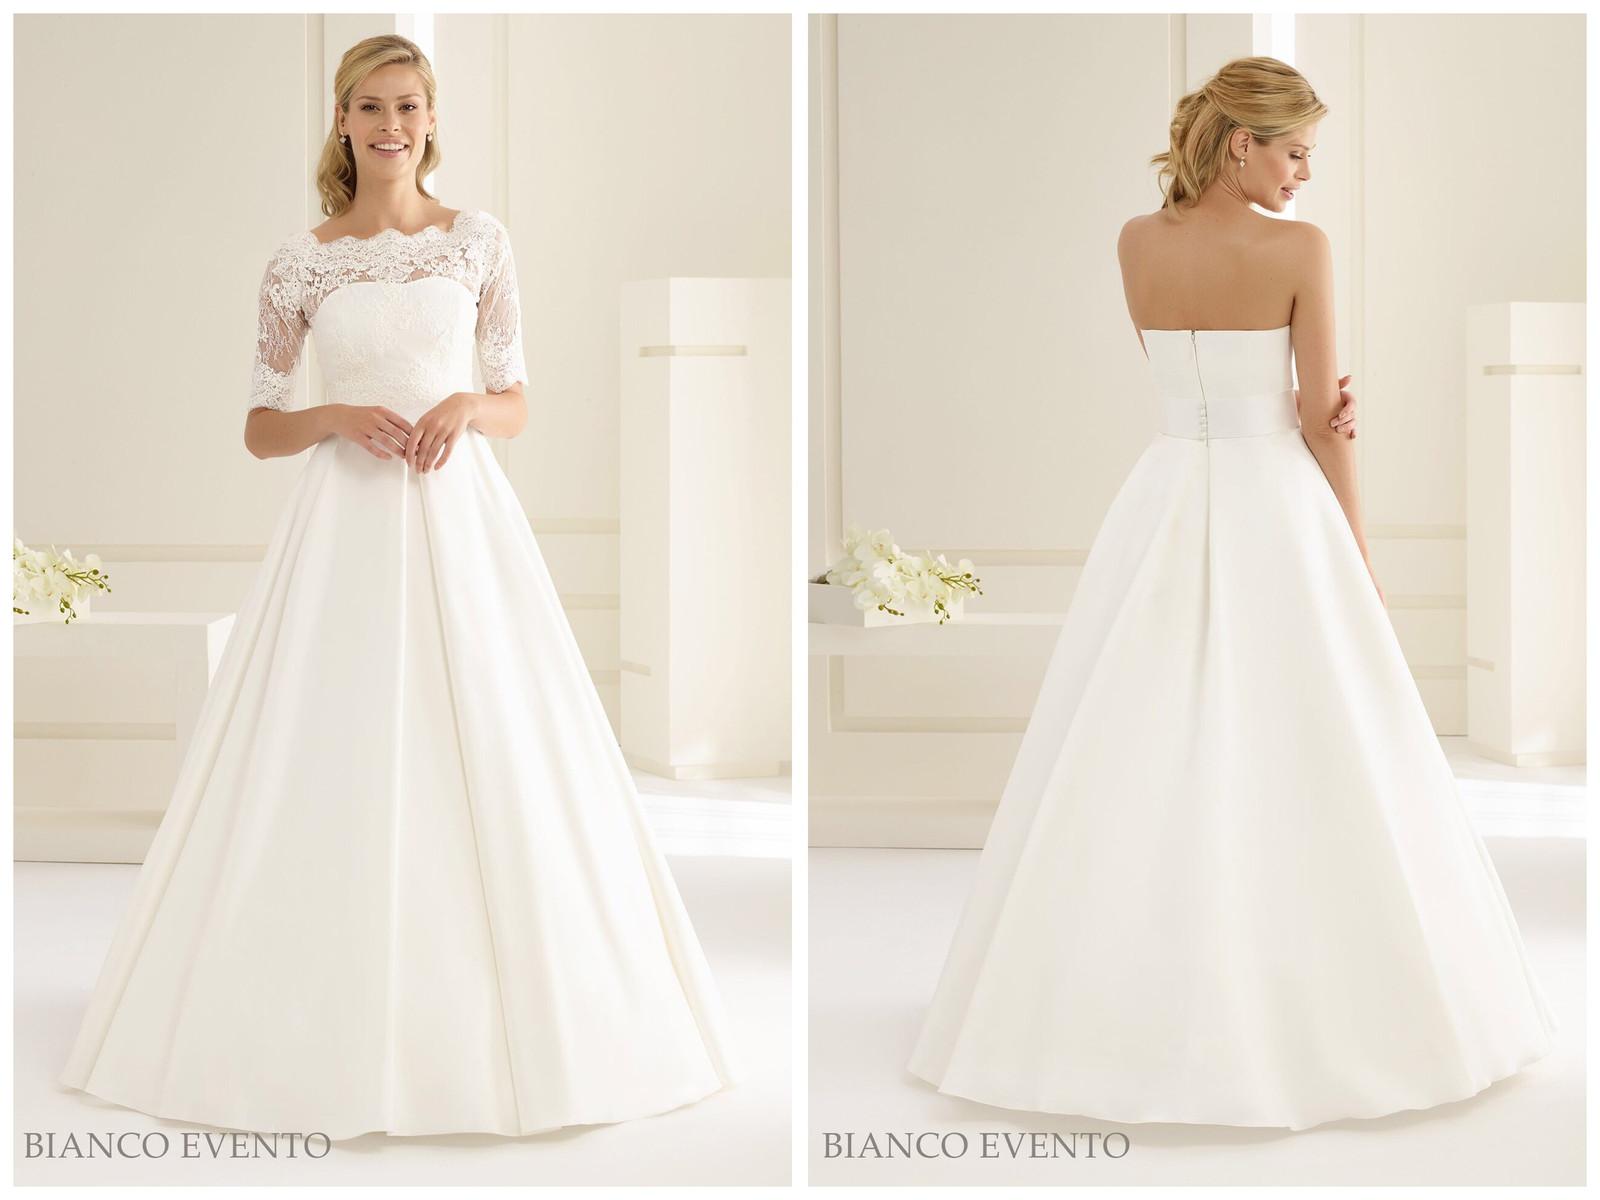 Bianco Evento Wedding Dresses in Colchester | Amara Bridal